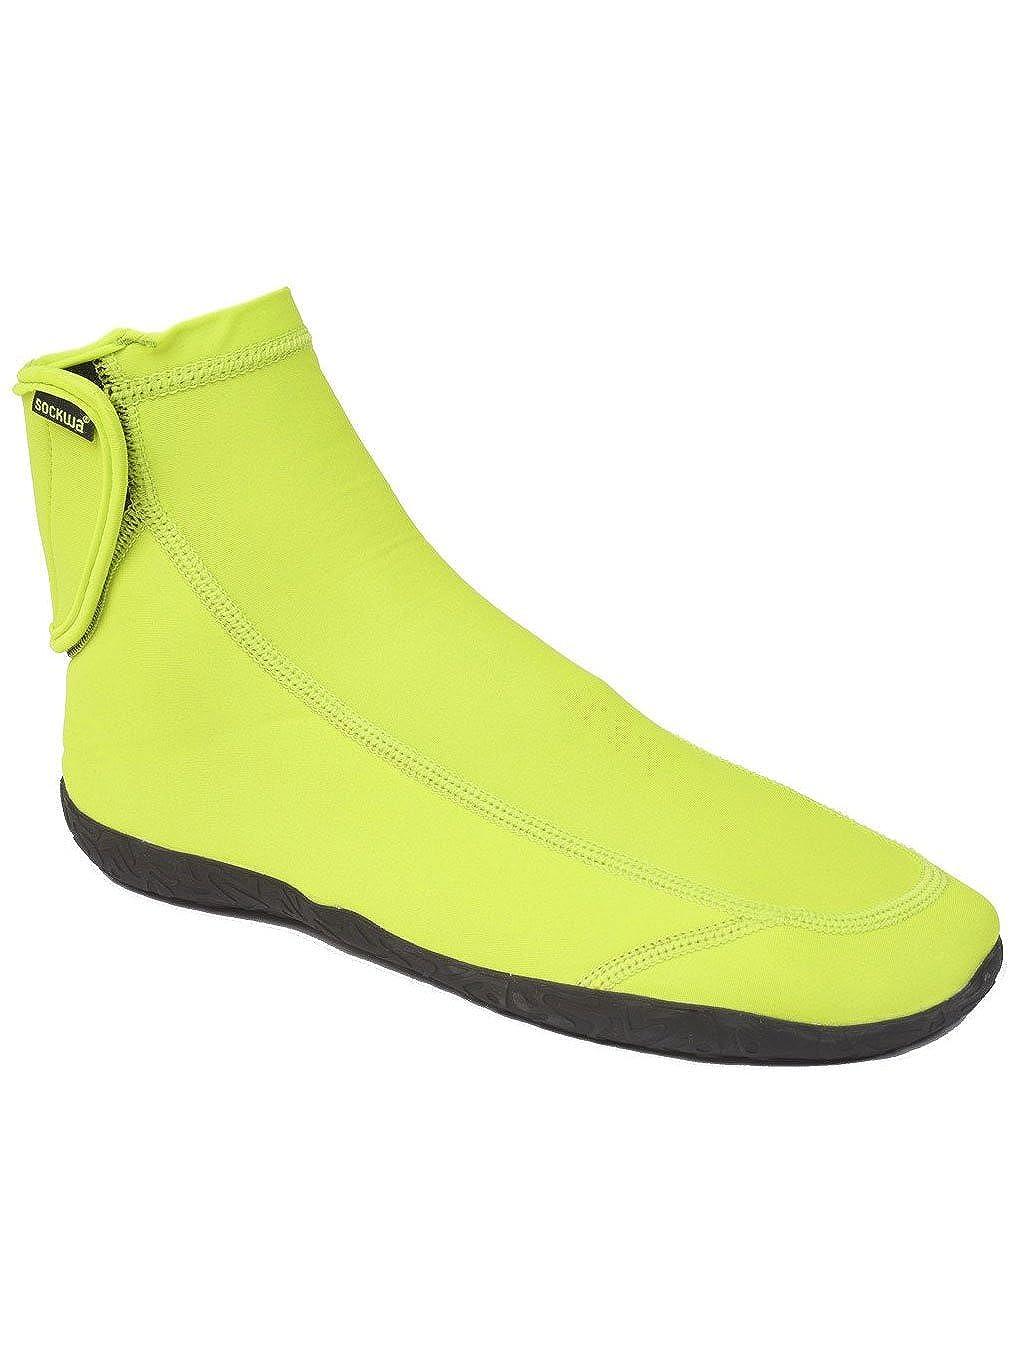 (M9/W10, Lime) - Sockwa G-HI Minimal Beach Sneaker   B00YWCPEZ8